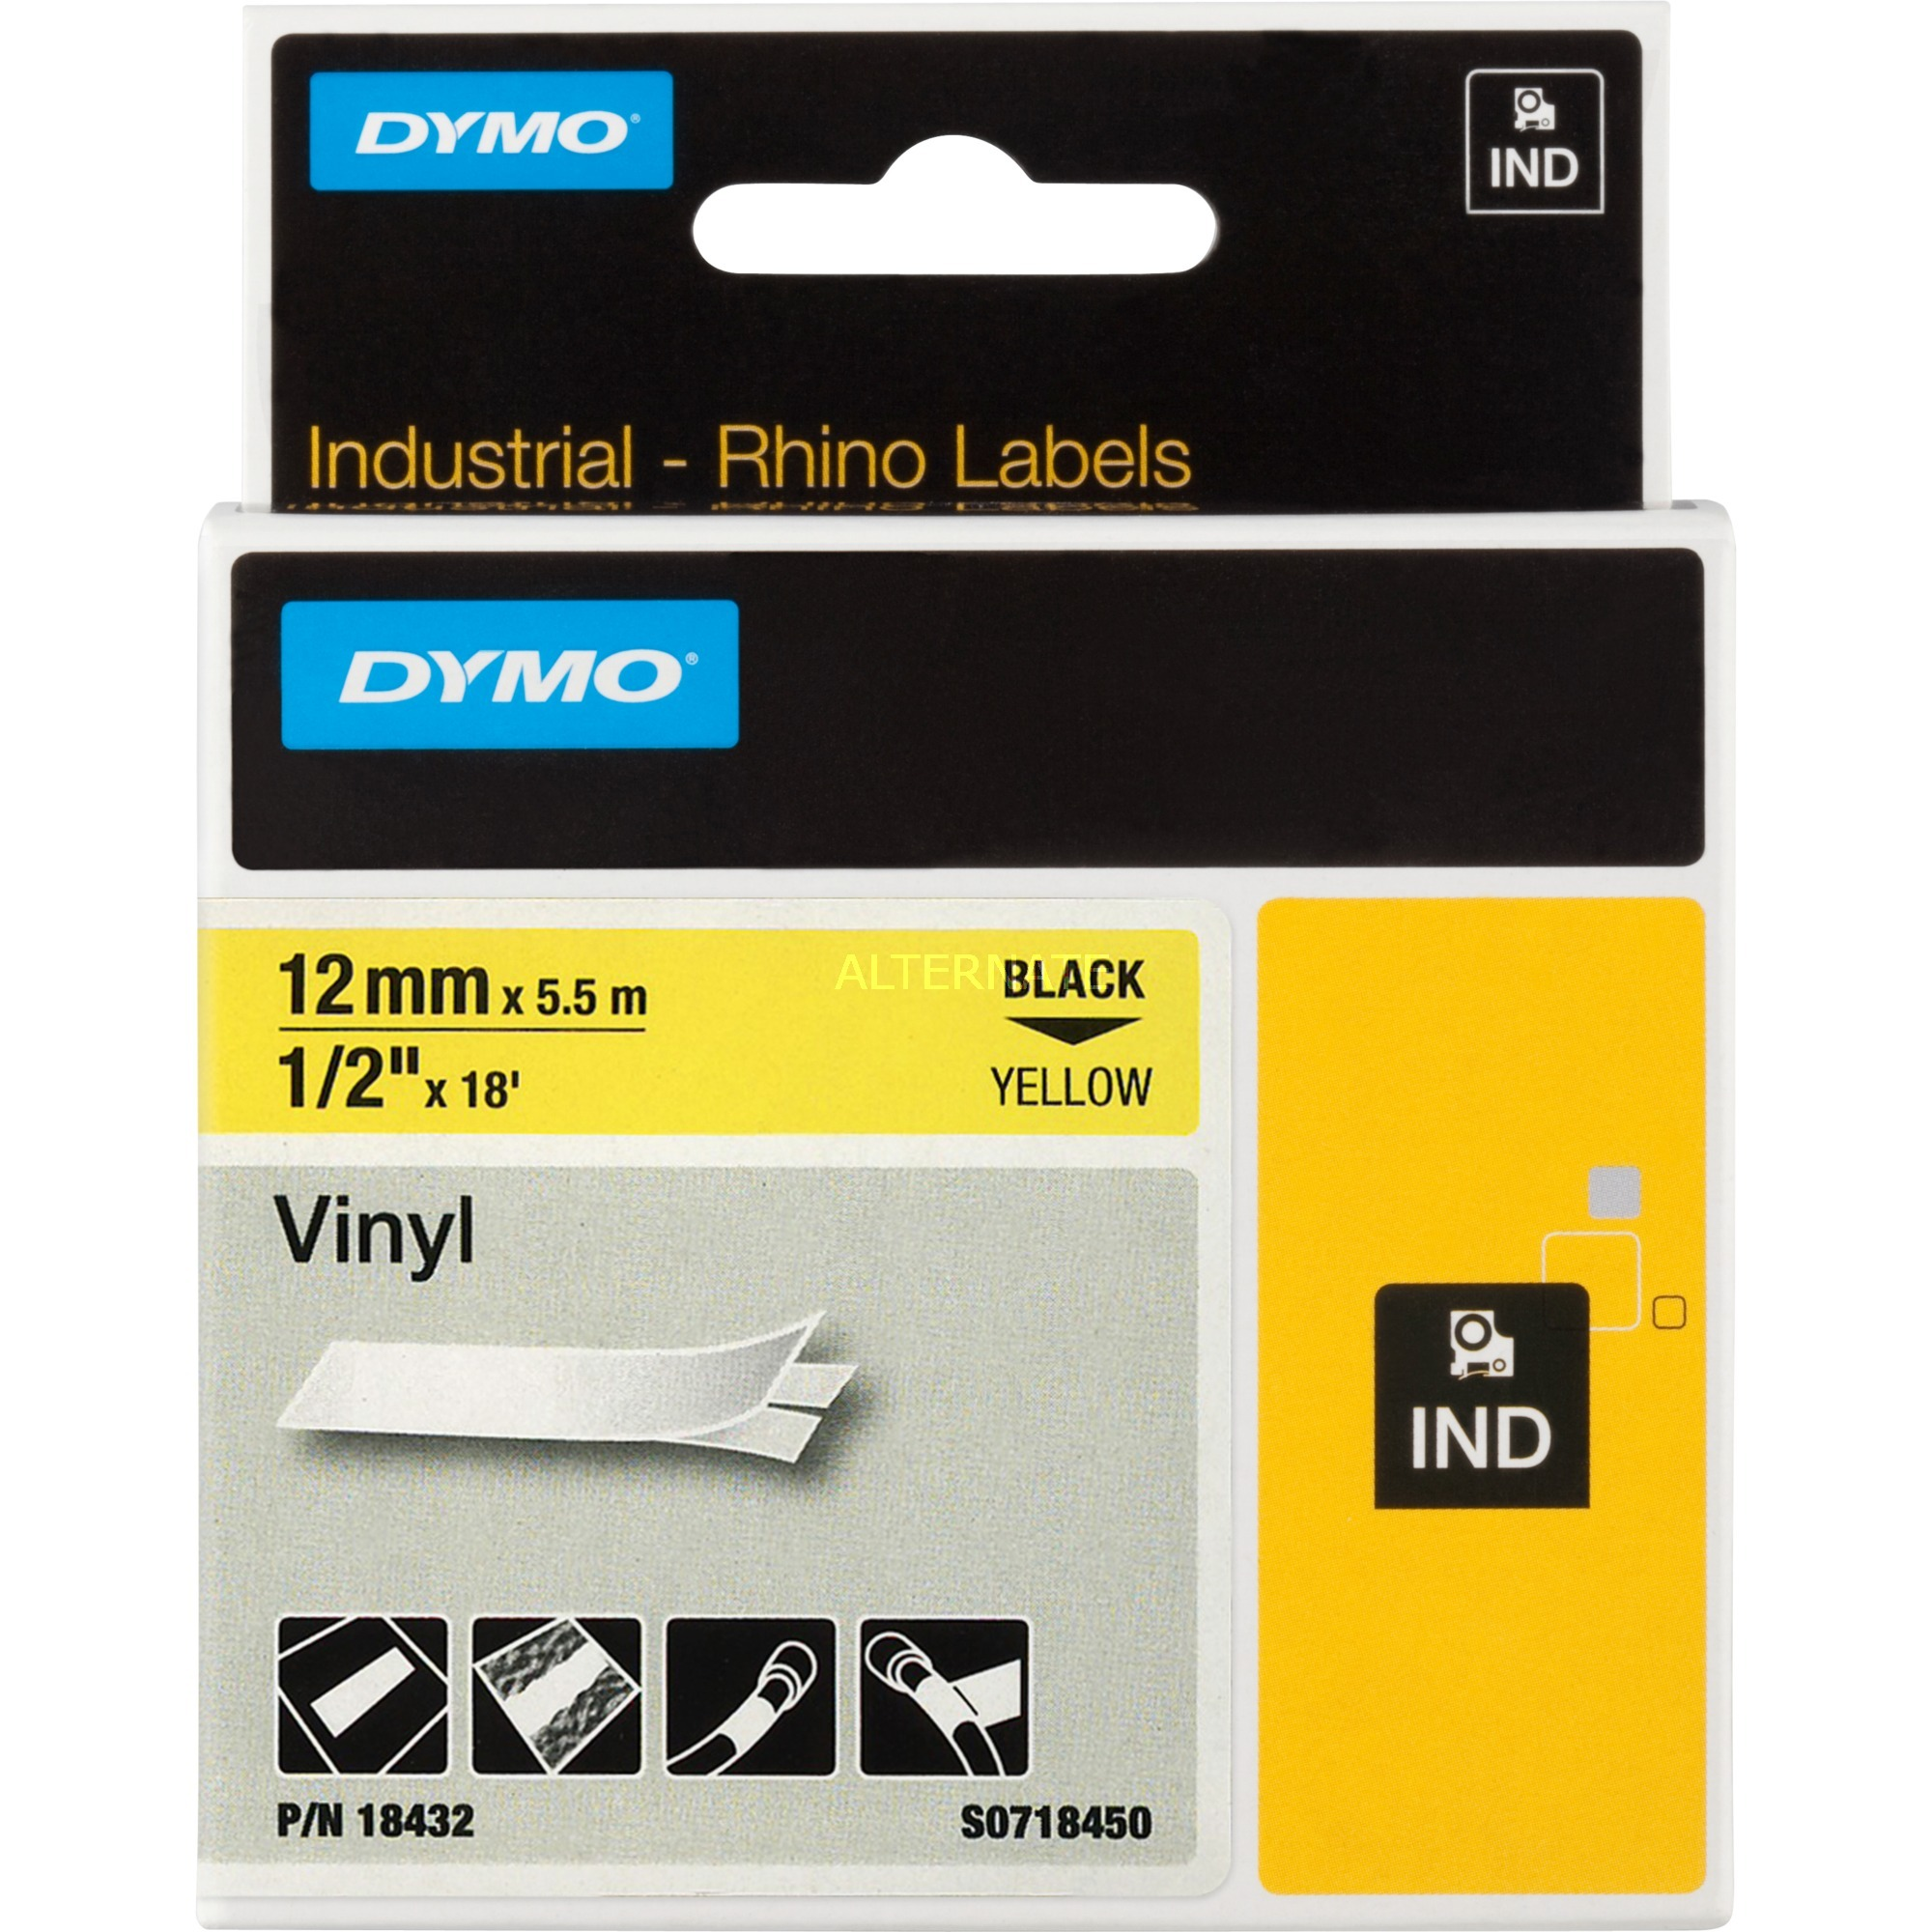 12mm RHINO Coloured Vinyl D1 cinta para impresora de etiquetas, Cinta de escritura